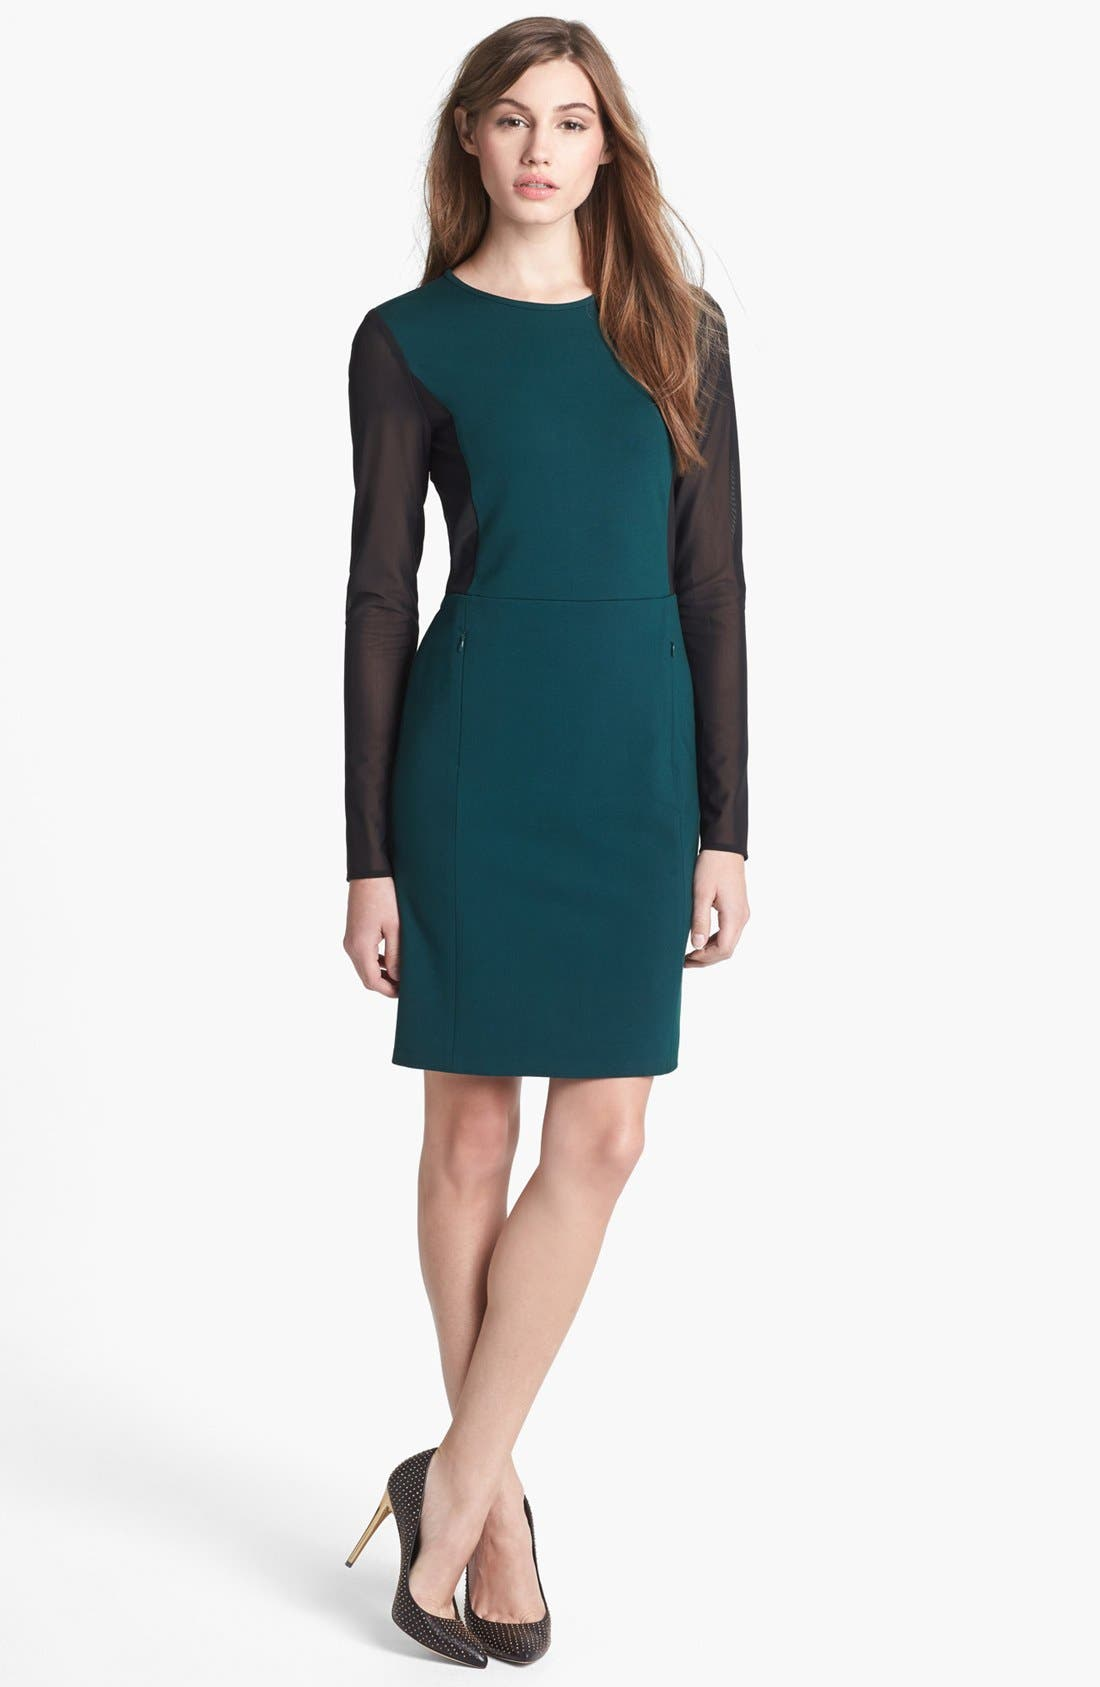 Alternate Image 1 Selected - Kenneth Cole New York 'Verrin' Dress